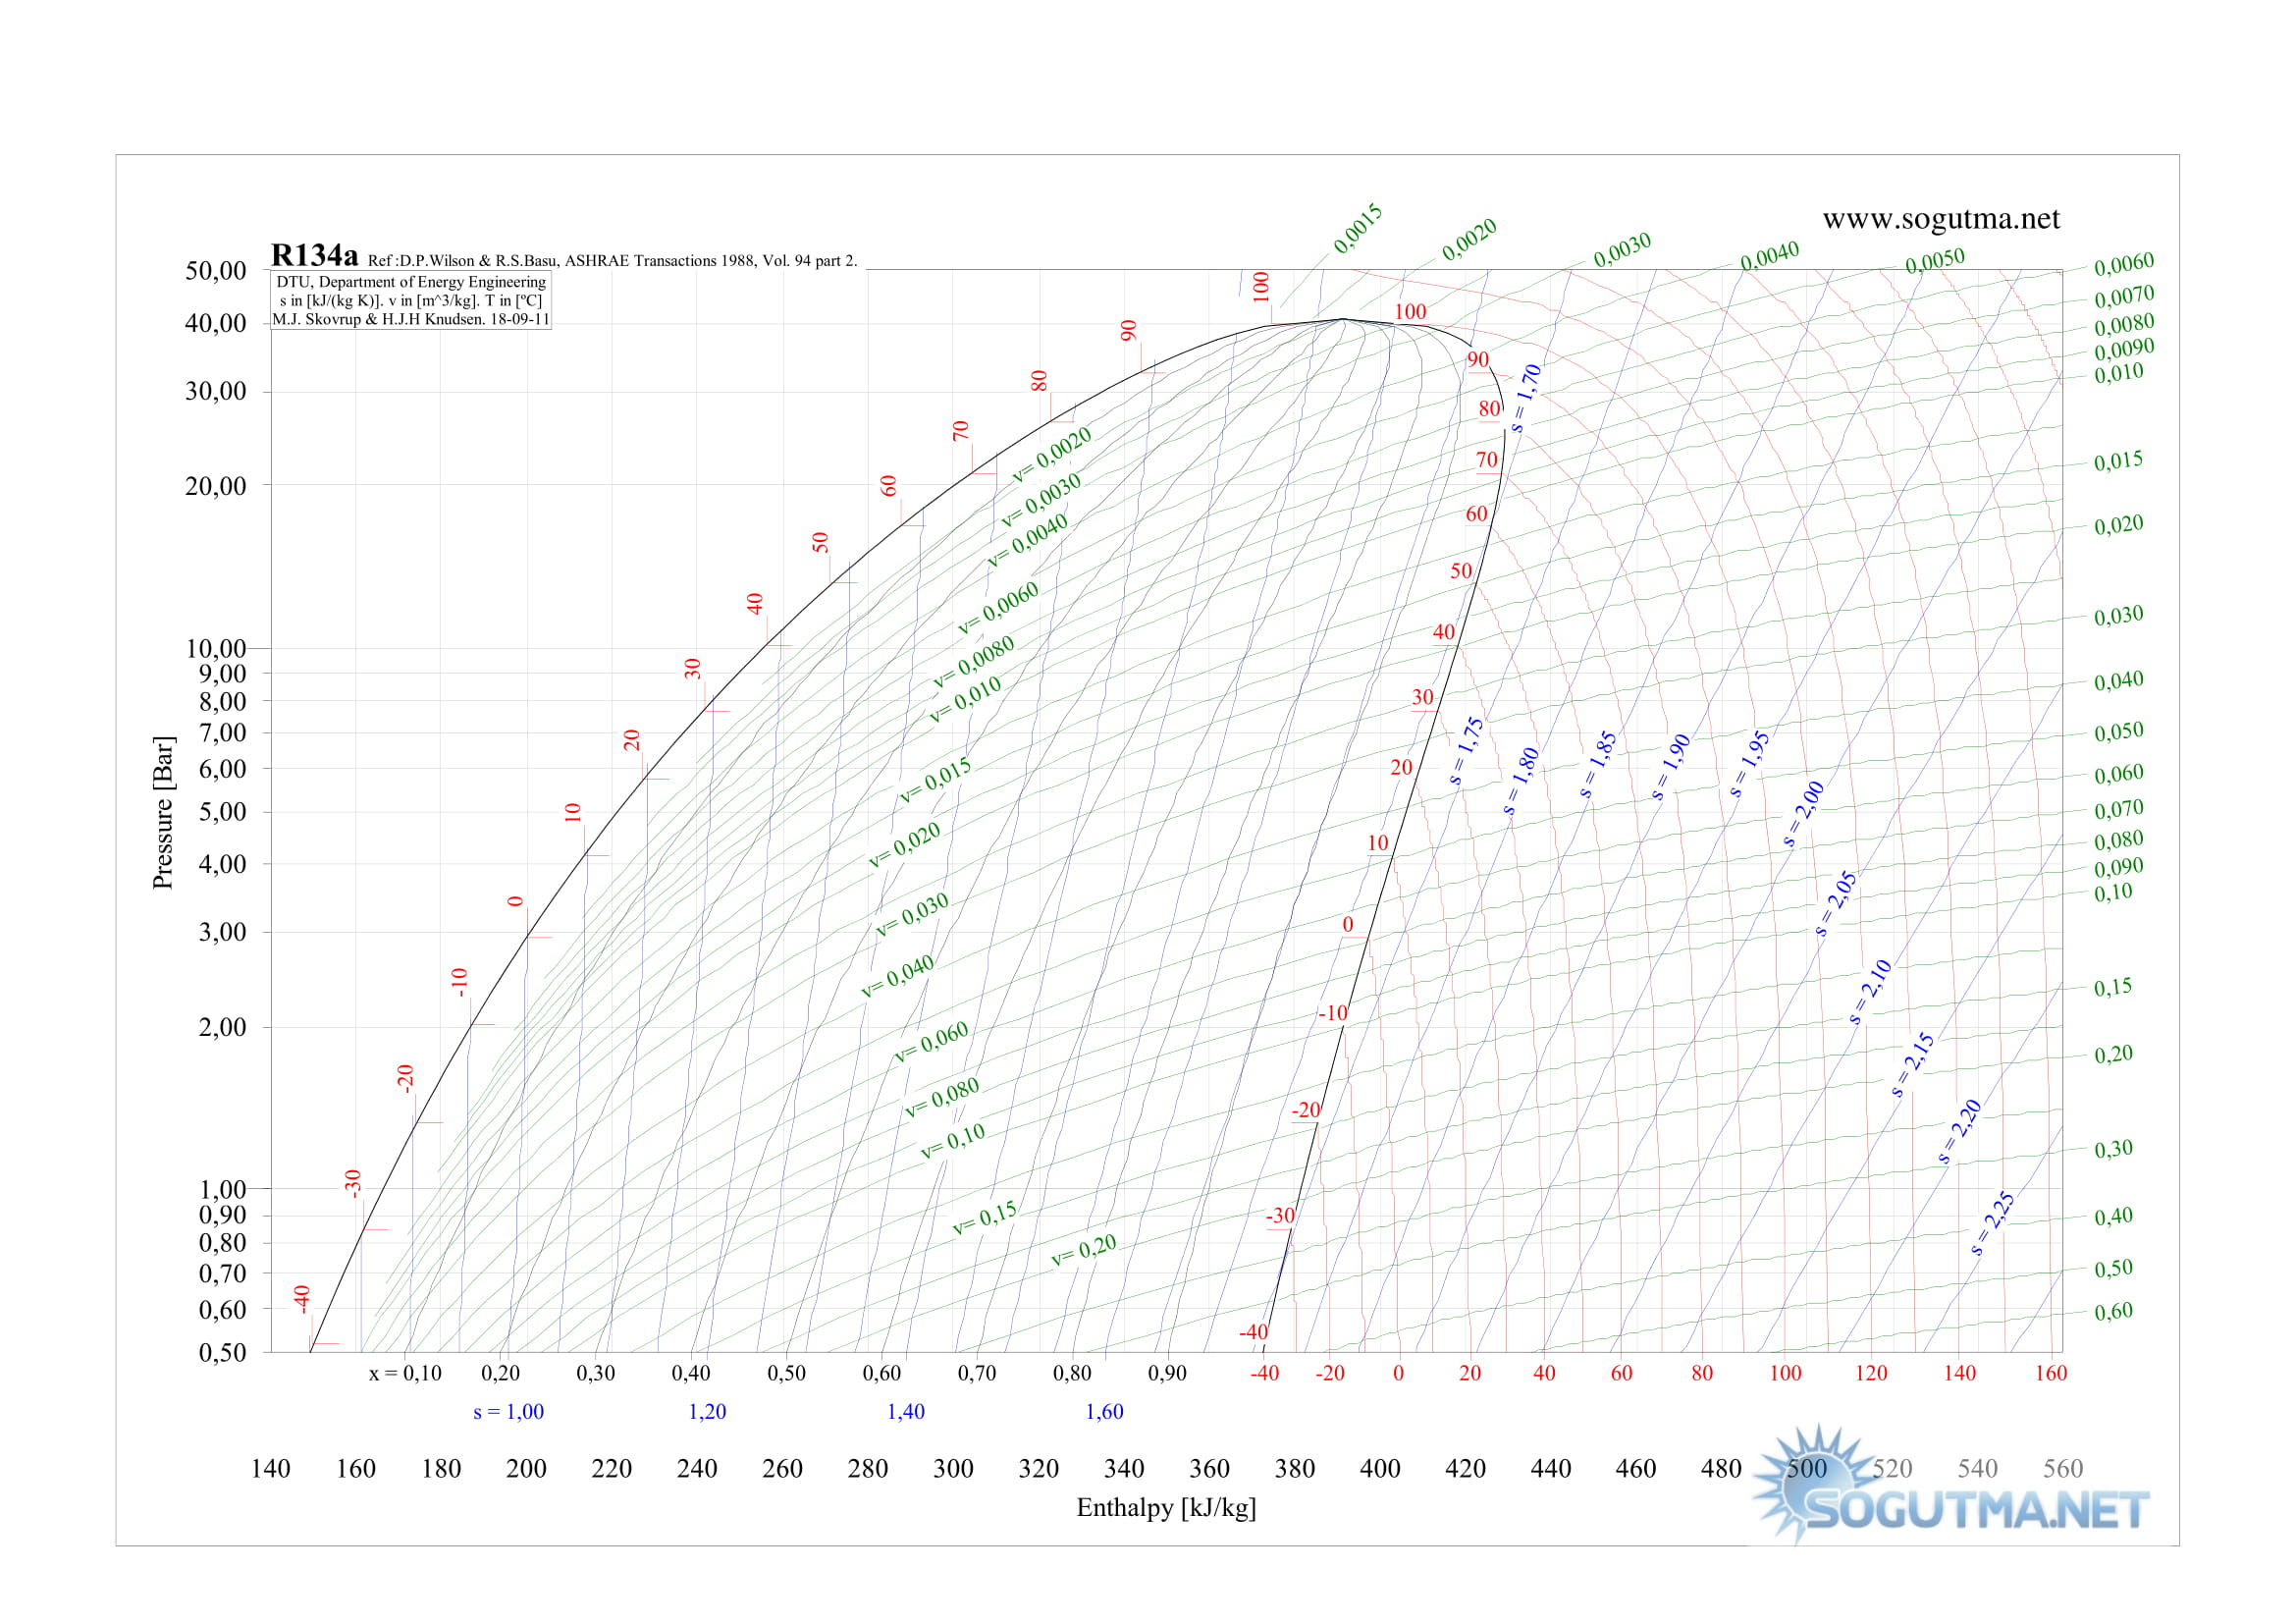 Soğutucu Akışkanlar - R134a (Freon 134a)